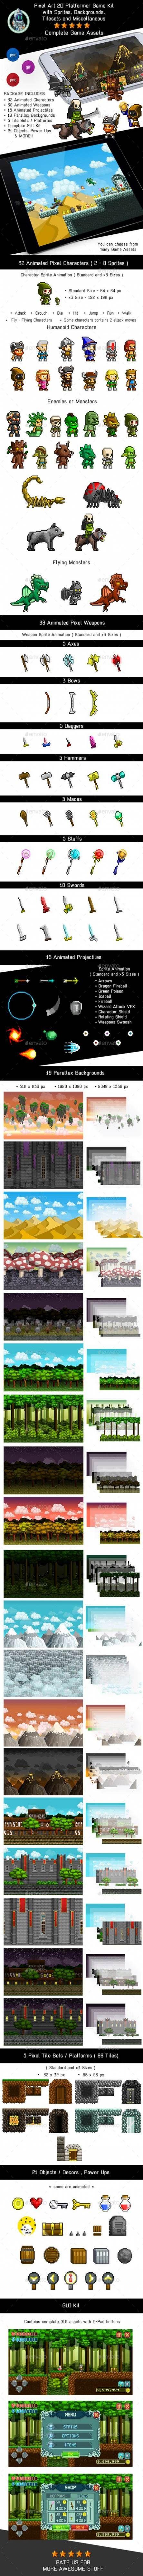 Platform games background character design 51 Ideas – Wrist Game